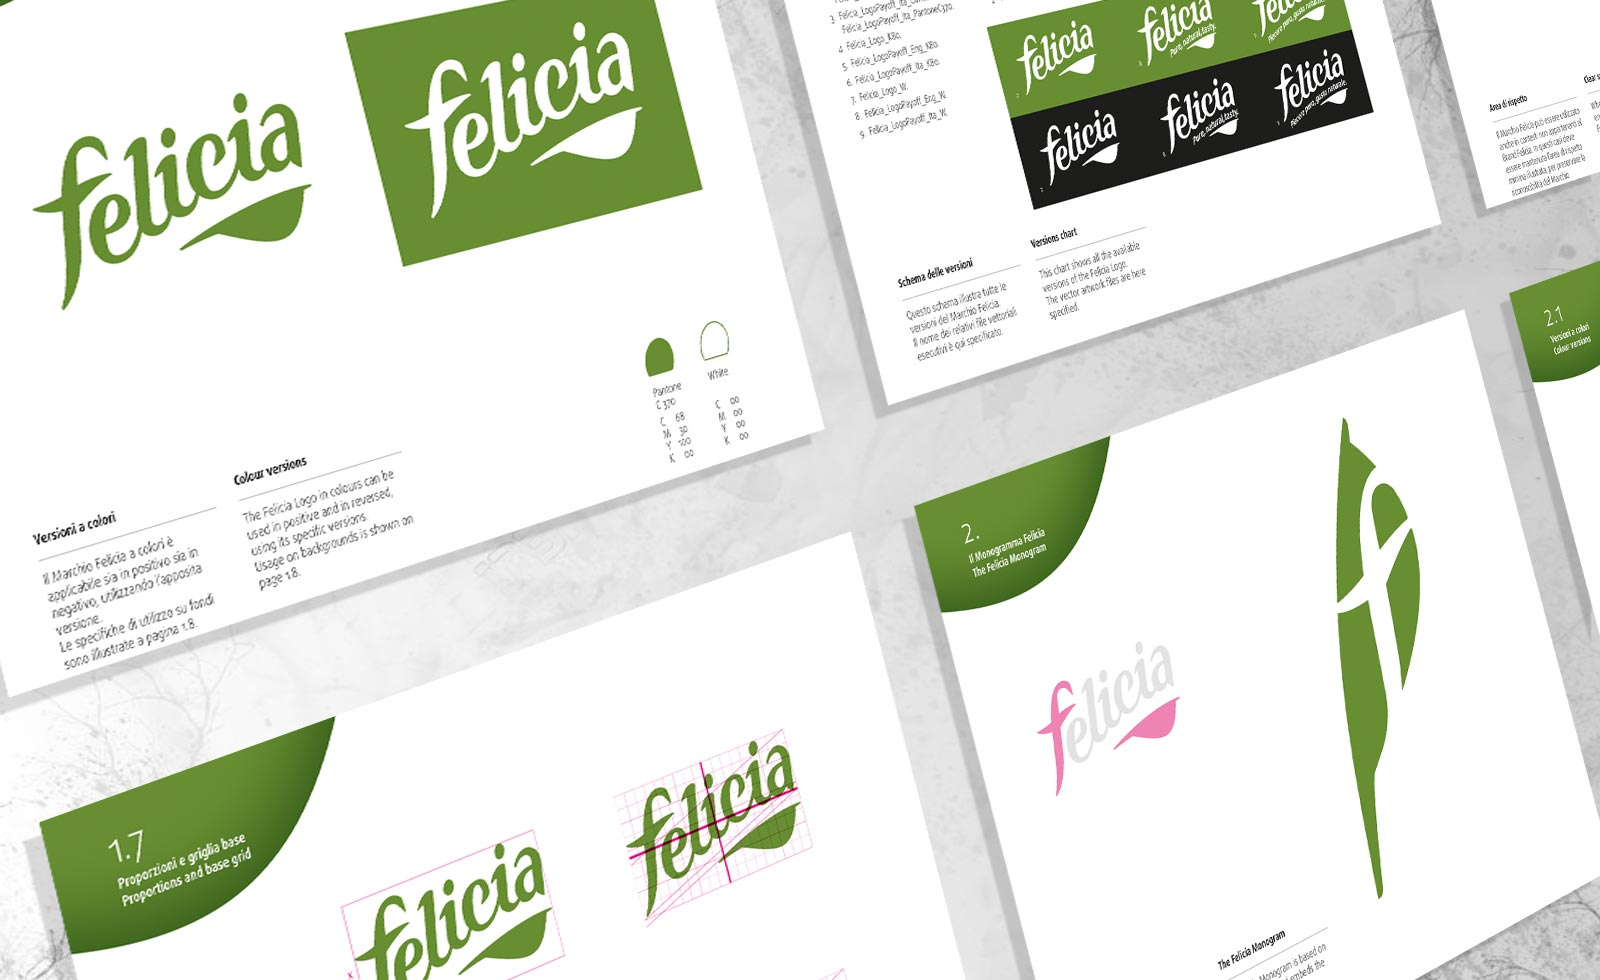 pasta Felicia gluten-free rebranding brandbook design guidelines